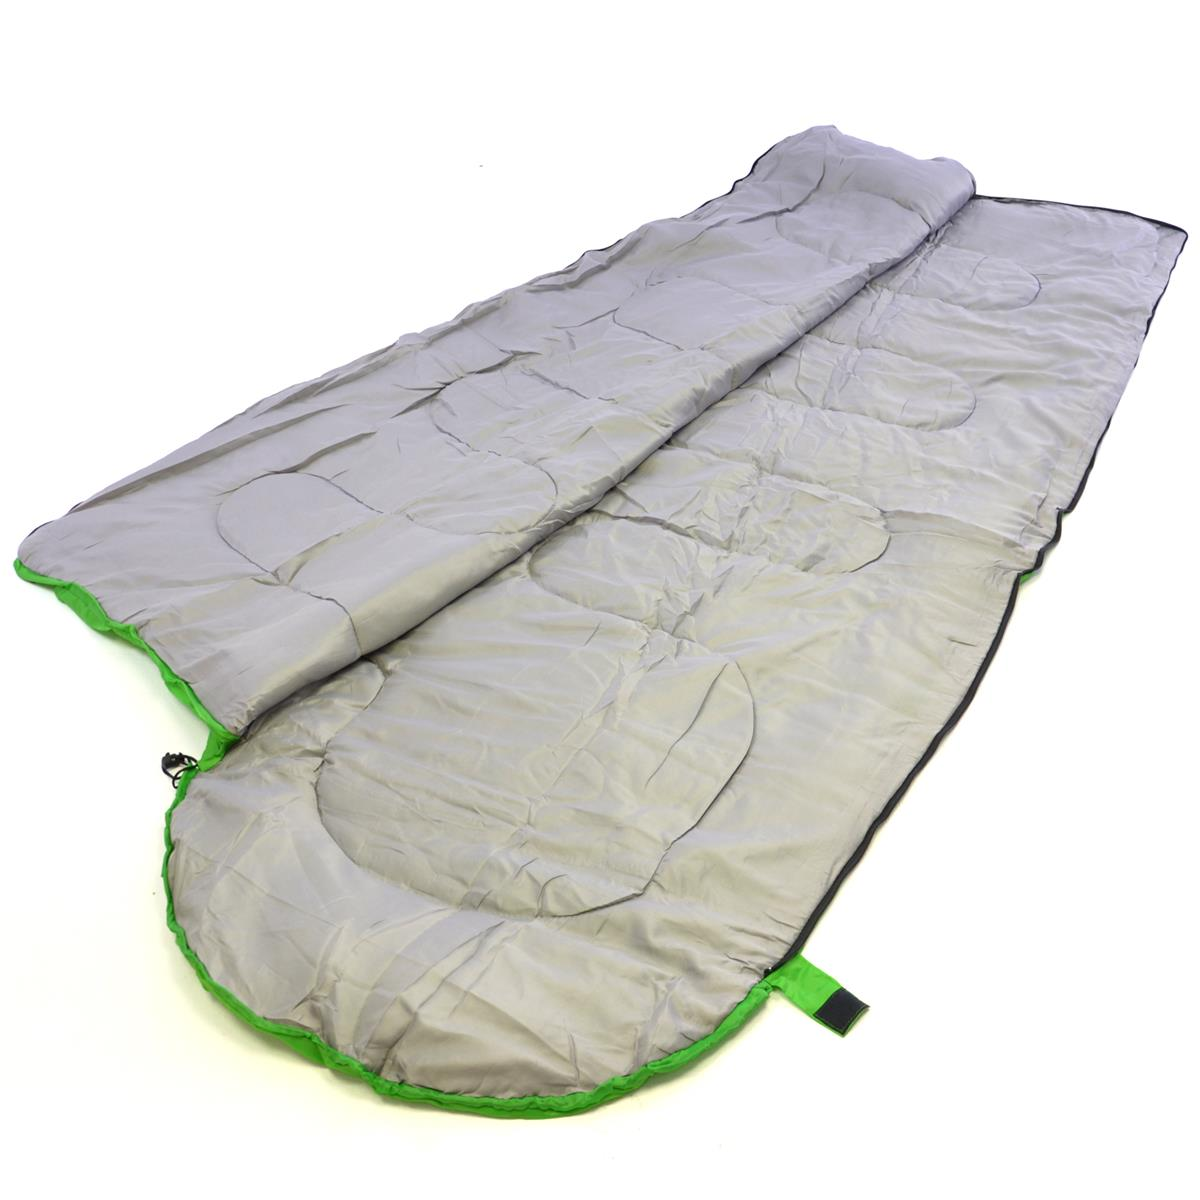 Schlafsack Alpa 200x70 cm Kapuze hellgrün 12-22°C 170T Polyester 200 g//m² 1 kg